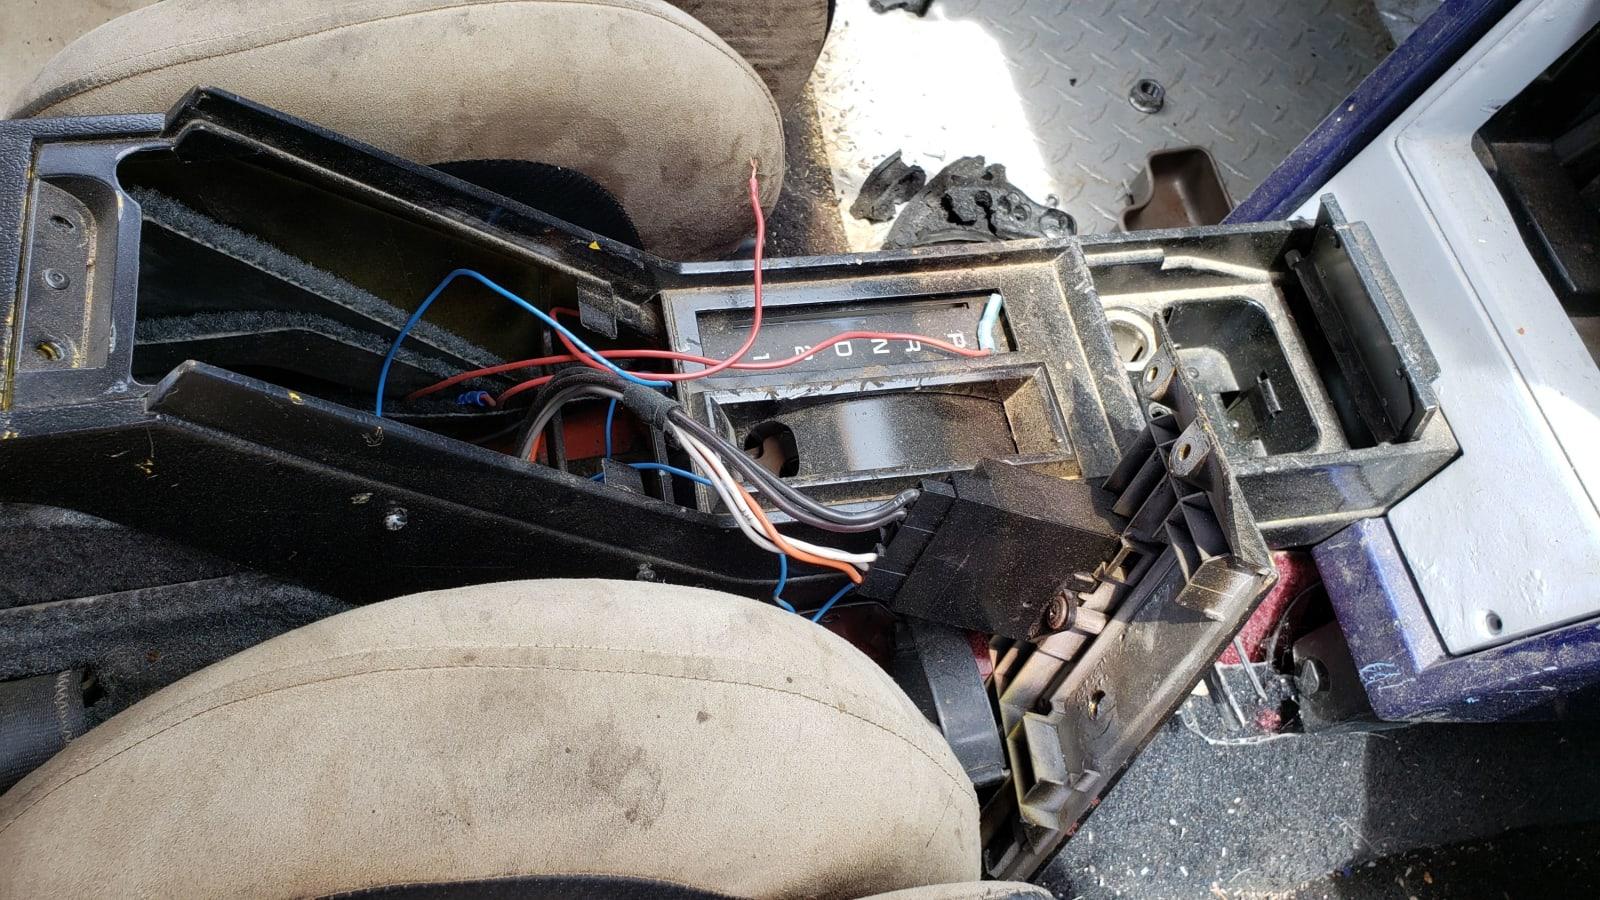 Junkyard Gem: 1987 Chrysler LeBaron Coupe